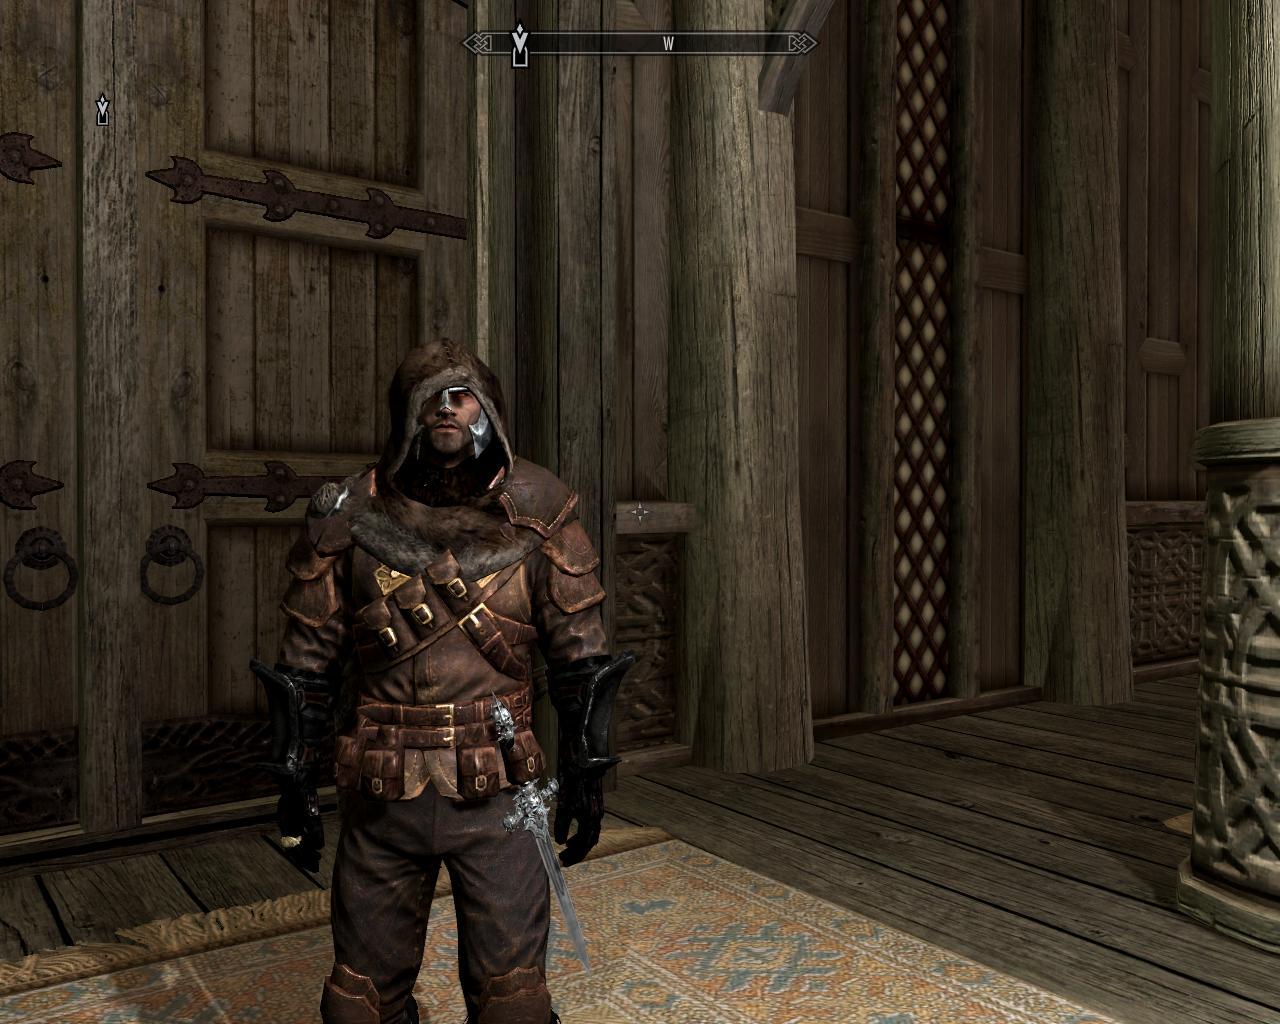 Меховая одежда (se) / furarmorsetse (frostfall aware) броня.